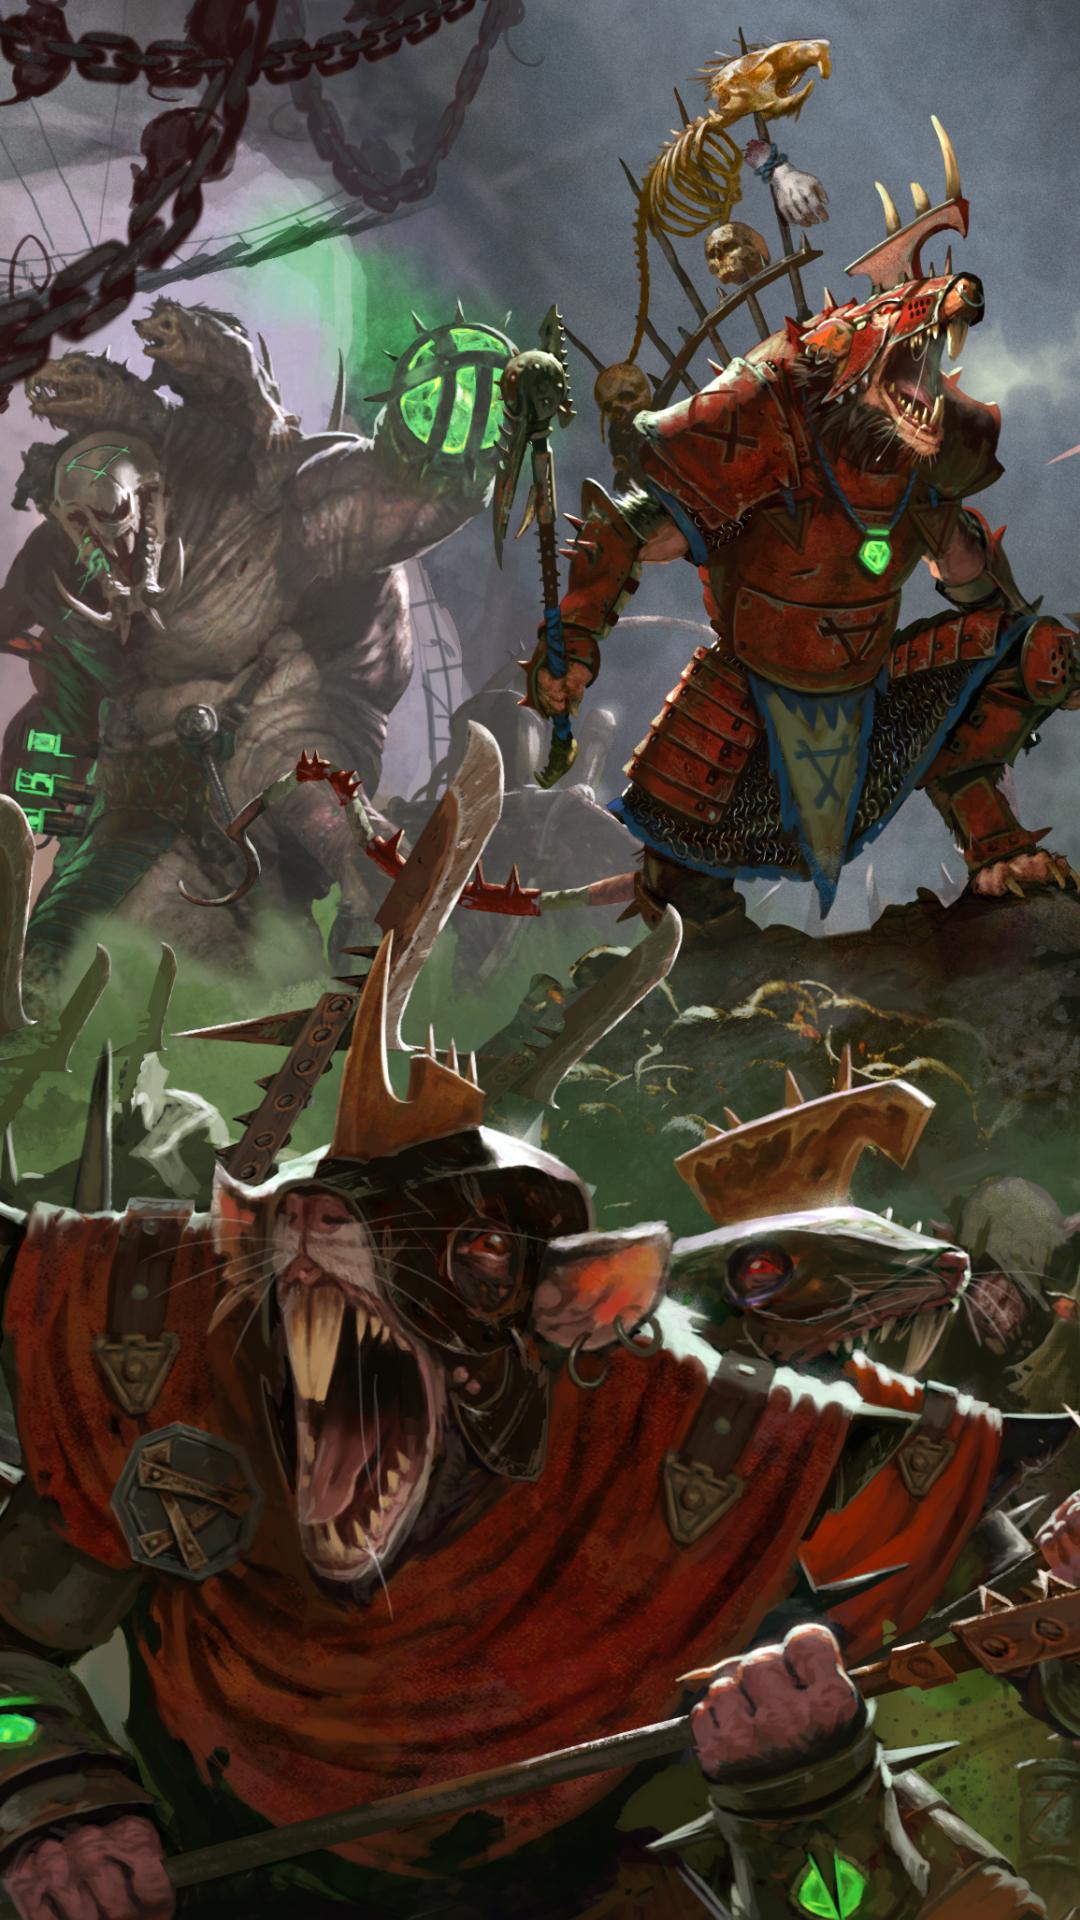 Free Download Mobile Wallpaper Total War Warhammer 2 Skaven